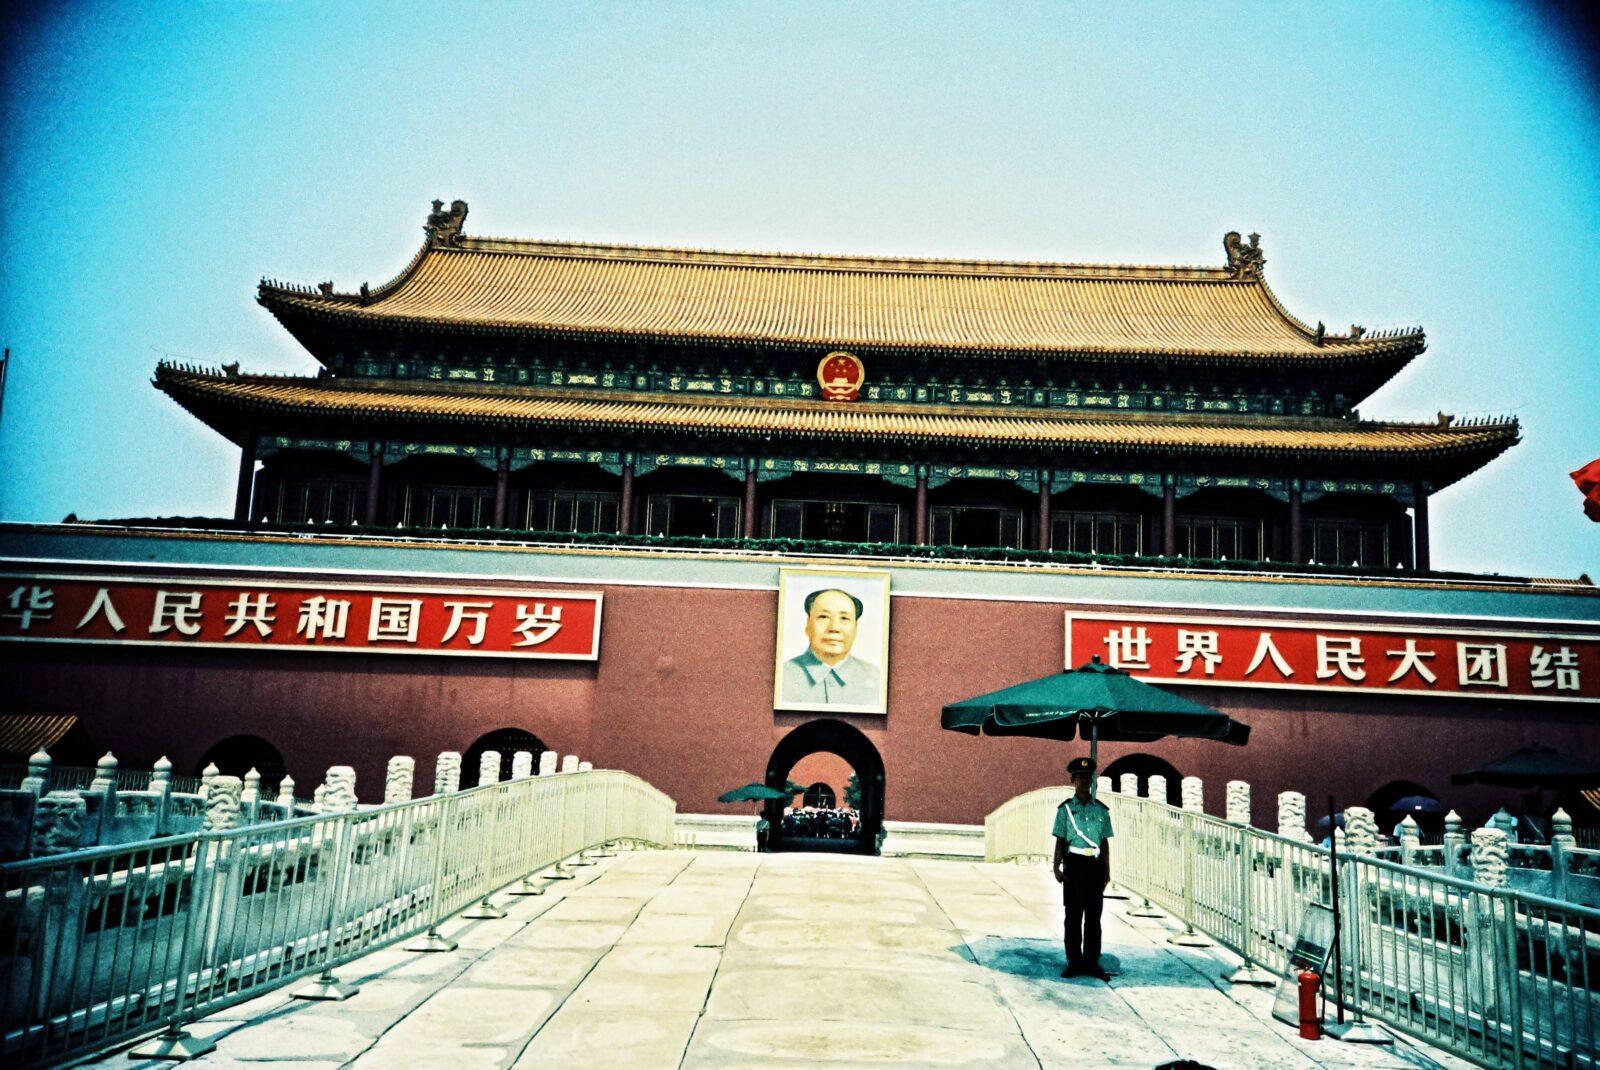 instaCDV 15 China roll11 Beijing ForbiddenCity 000019